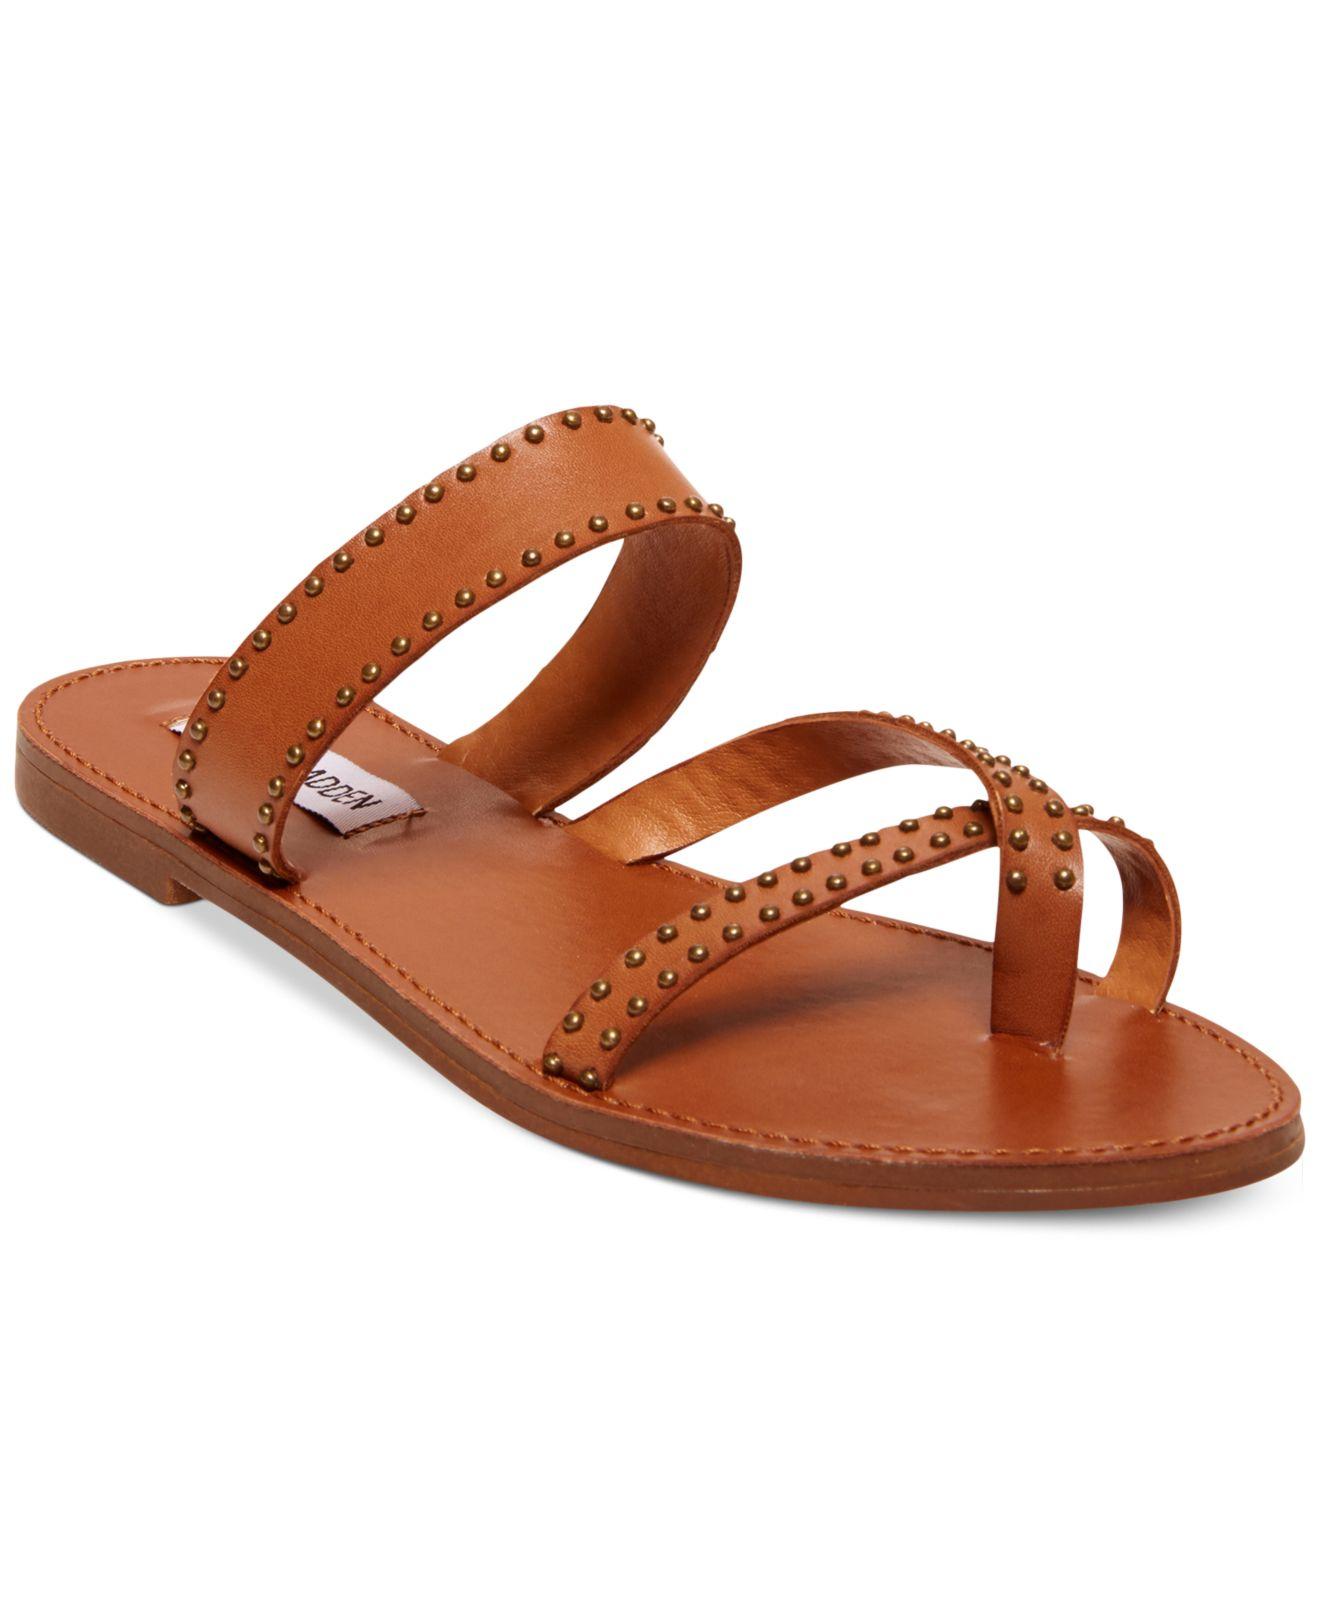 0ed3412a6d7 Lyst - Steve Madden Women S Aveery Flat Sandals in Brown